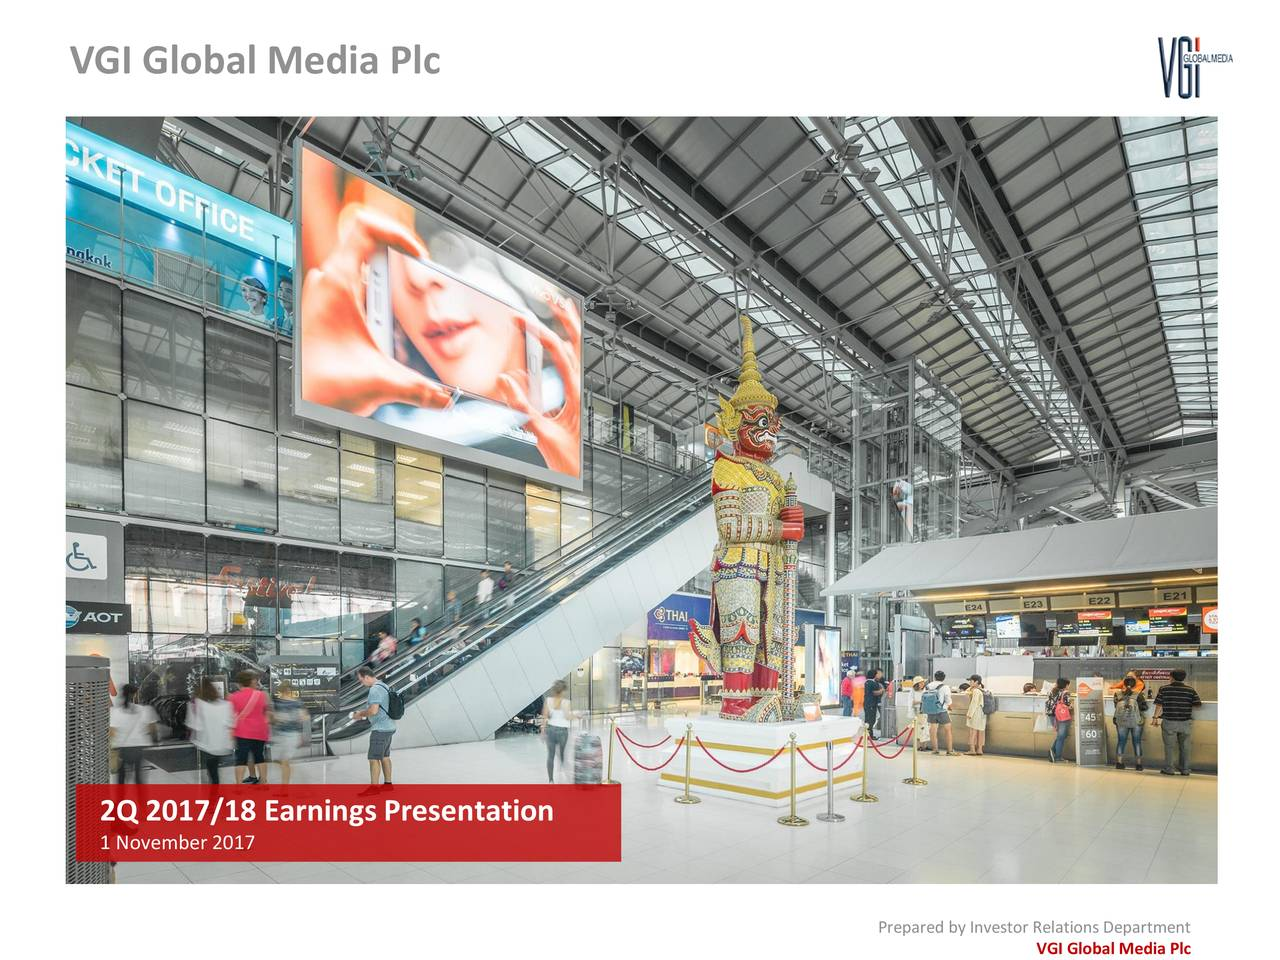 2Q 2017/18 Earnings Presentation 1 November 2017 Prepared by Investor Relations Department